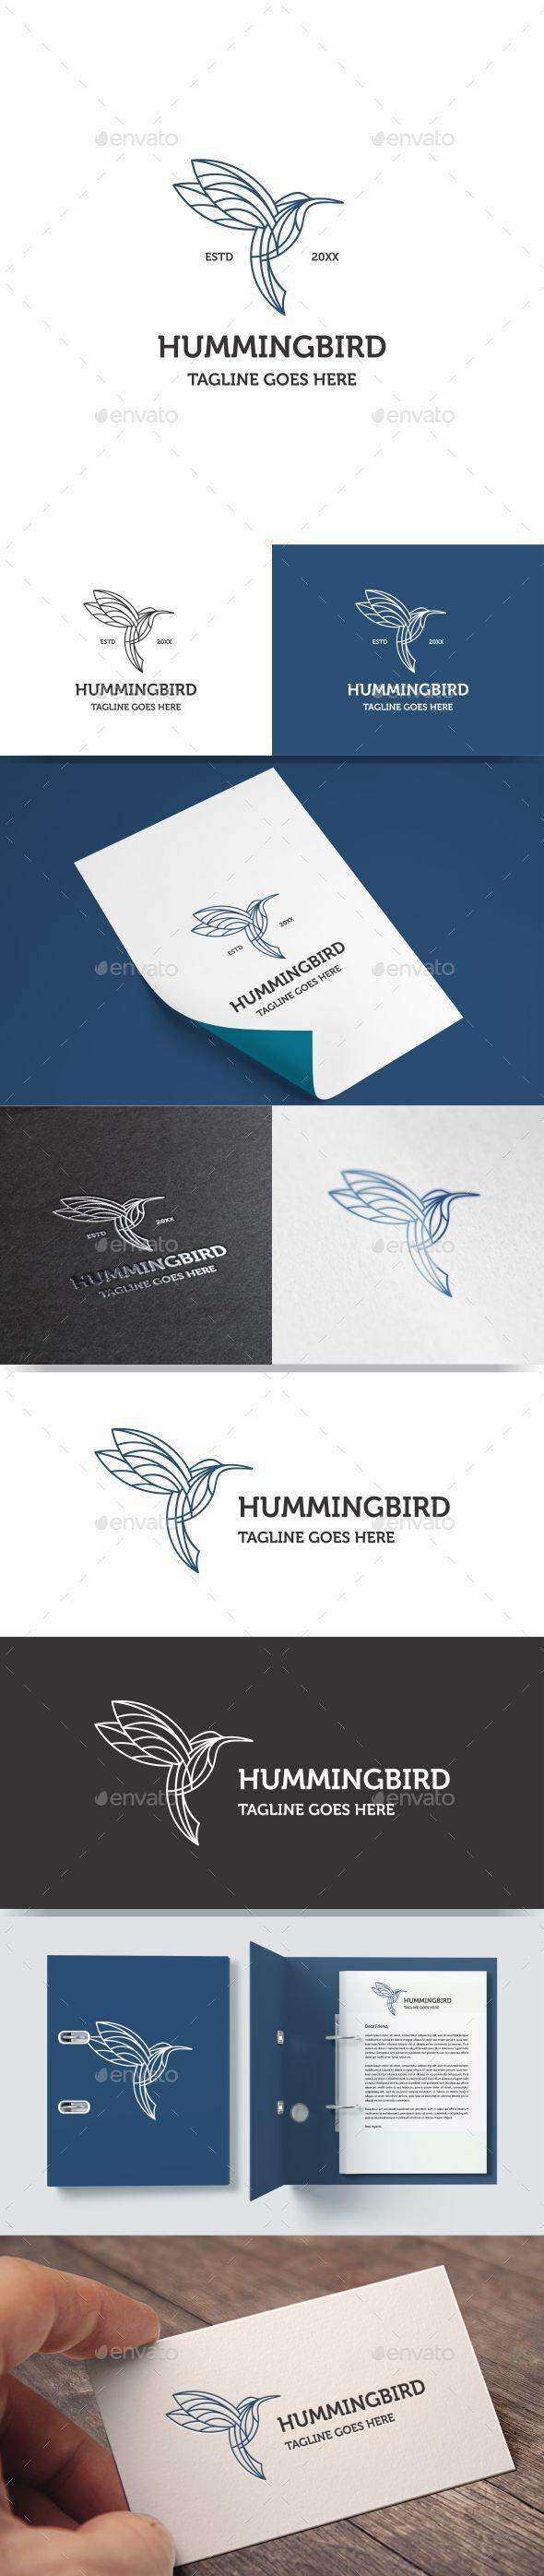 Monoline Hummingbird Logo Icon - Animals Logo Templates